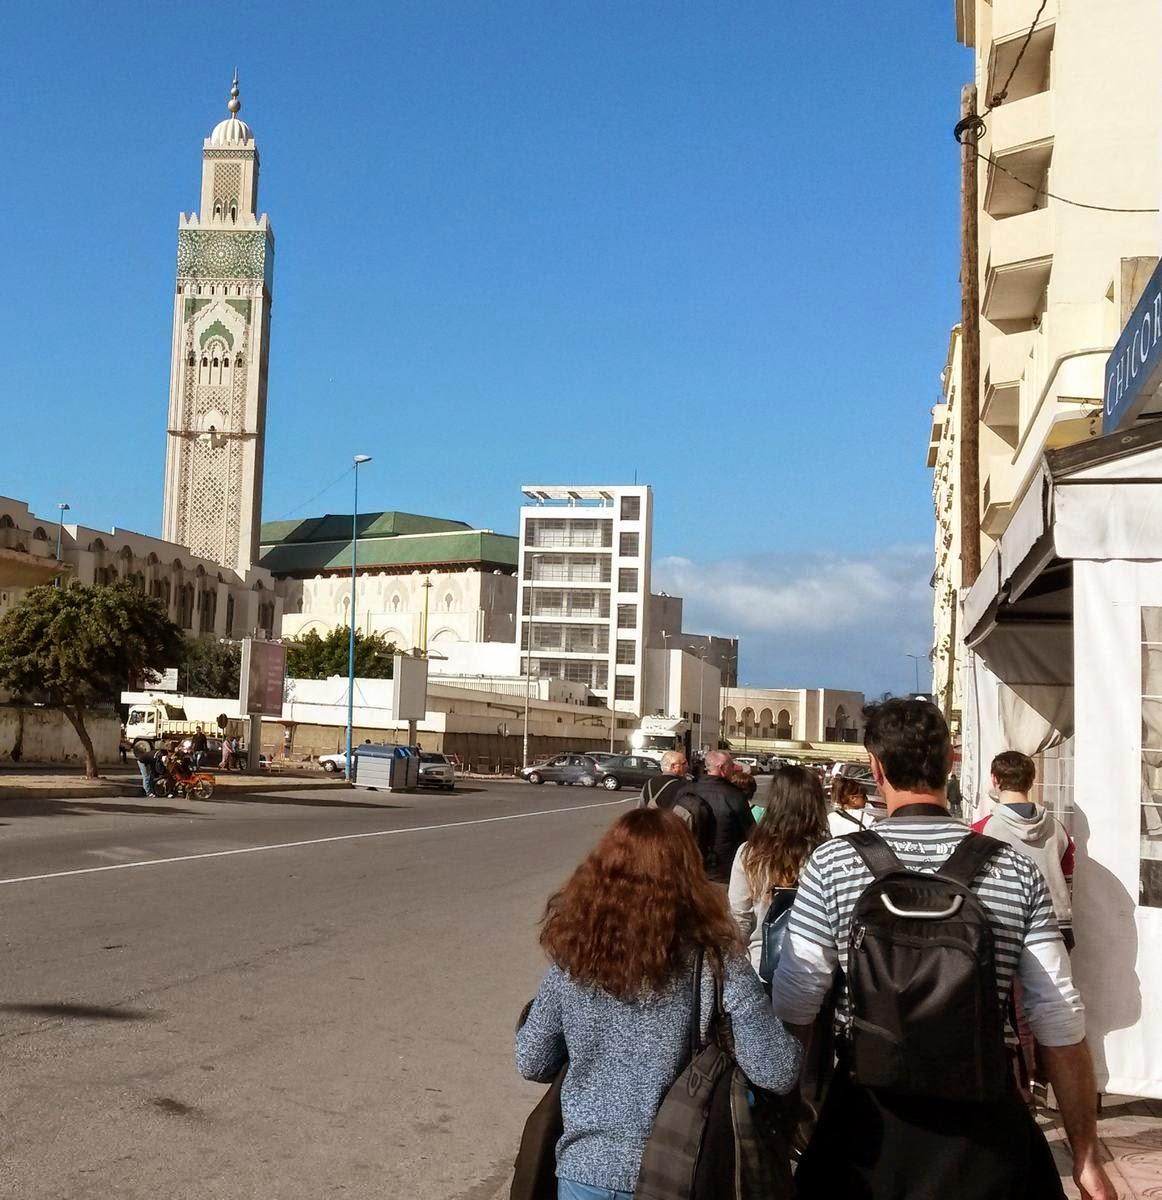 mezquita hassan II, Casablanca, Marruecos, mezquitas de Marruecos, mezquitas mas grandes, mezquitas, mezquitas siglo XX